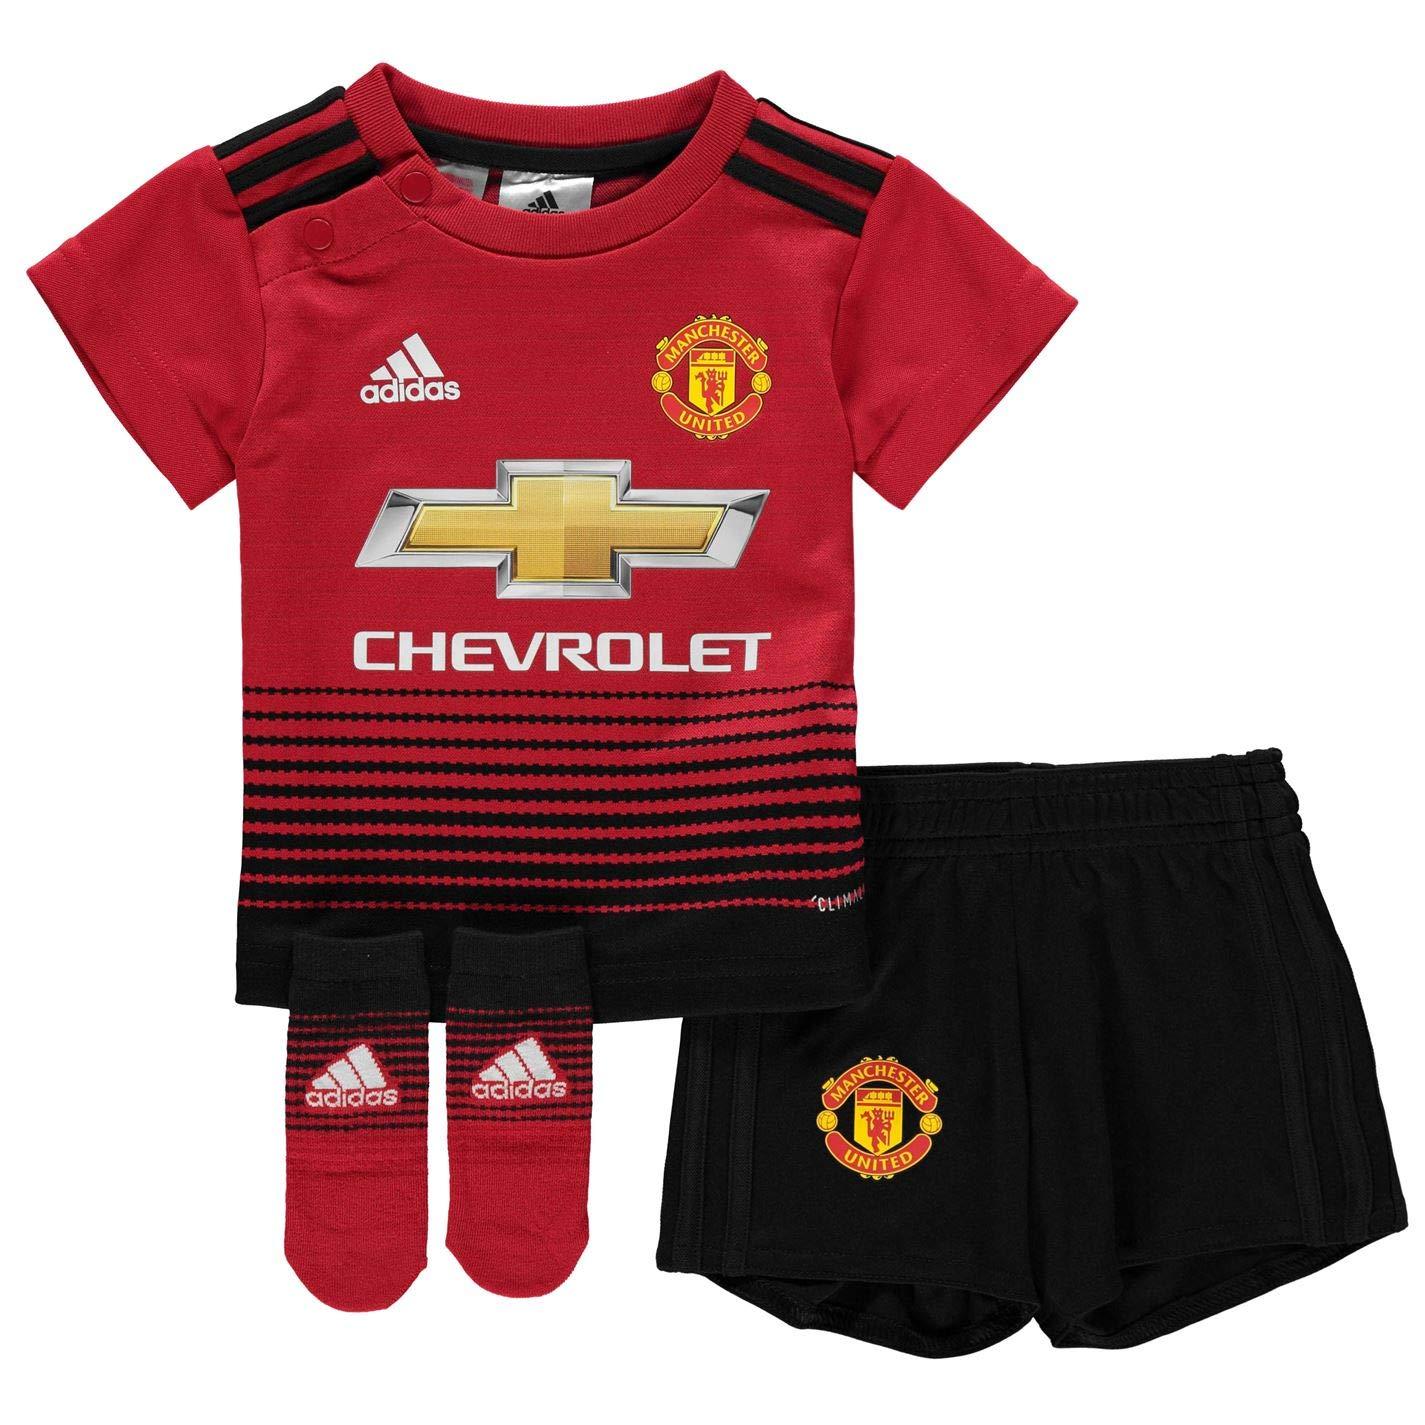 adidas Originals Unisex Baby Manchester United FC Home Mini Kit Home, CG0056